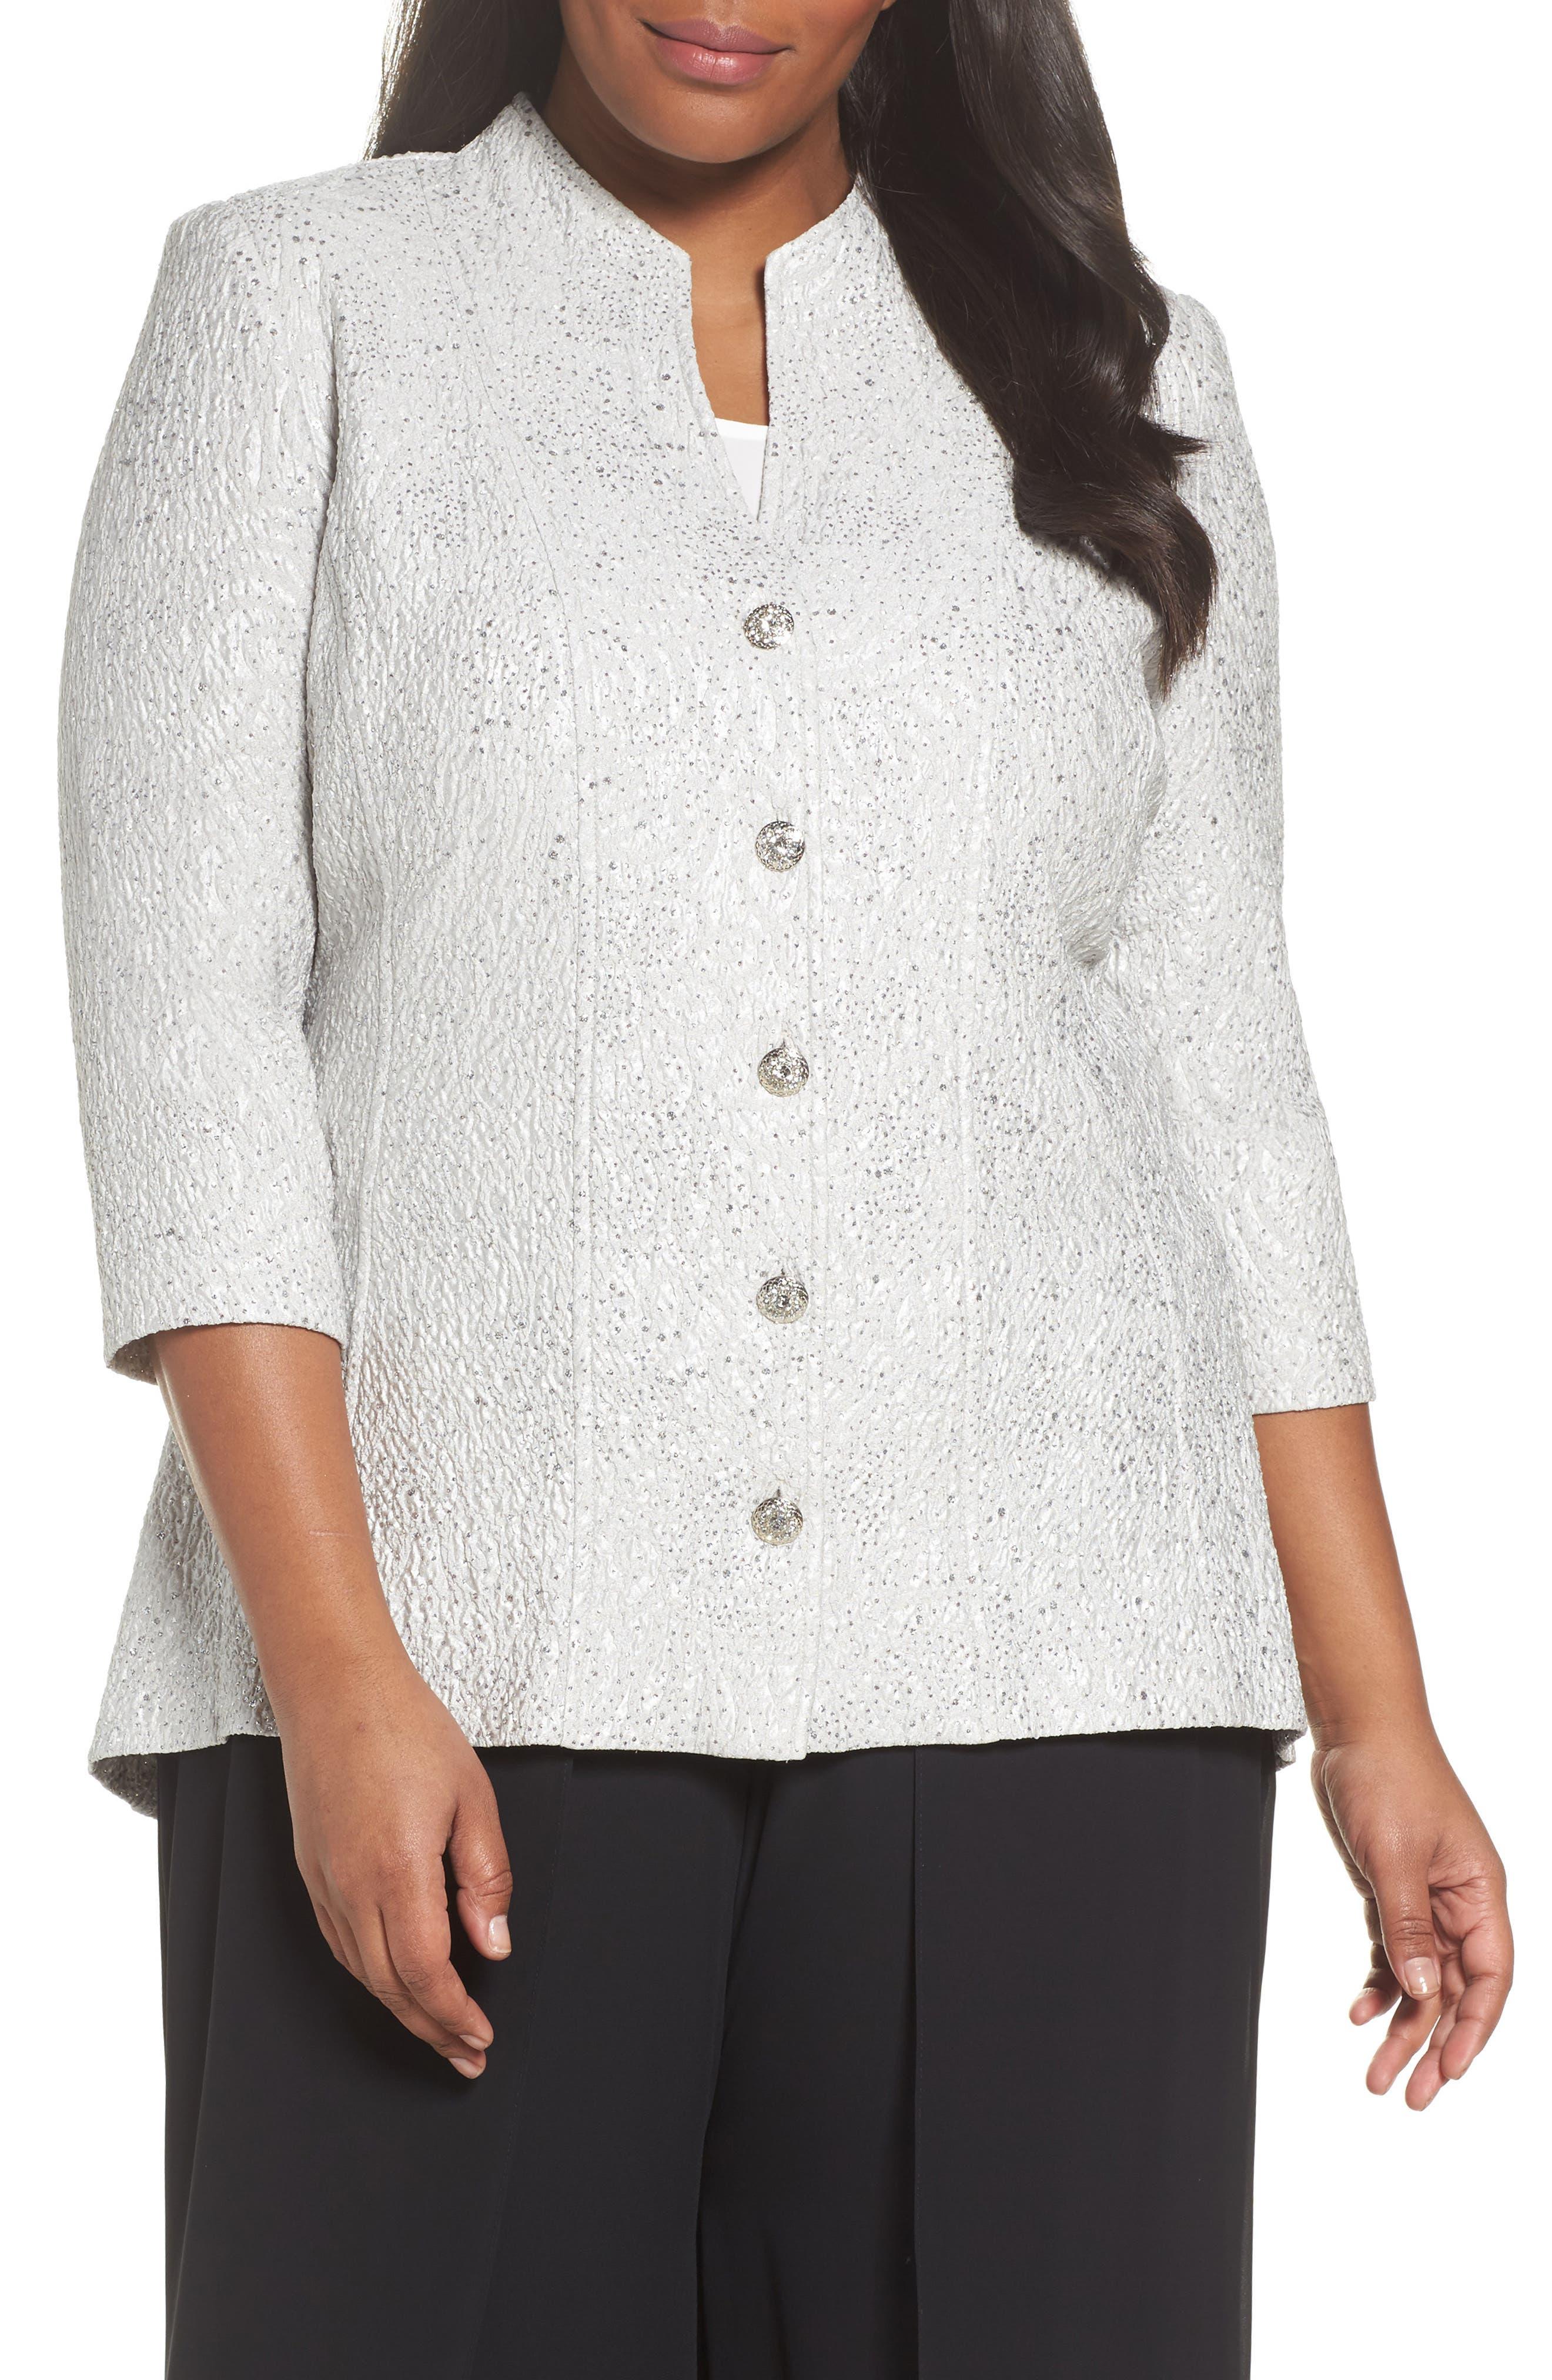 Alternate Image 1 Selected - Alex Evenings Mandarin Collar Shimmer Jacket (Plus Size)